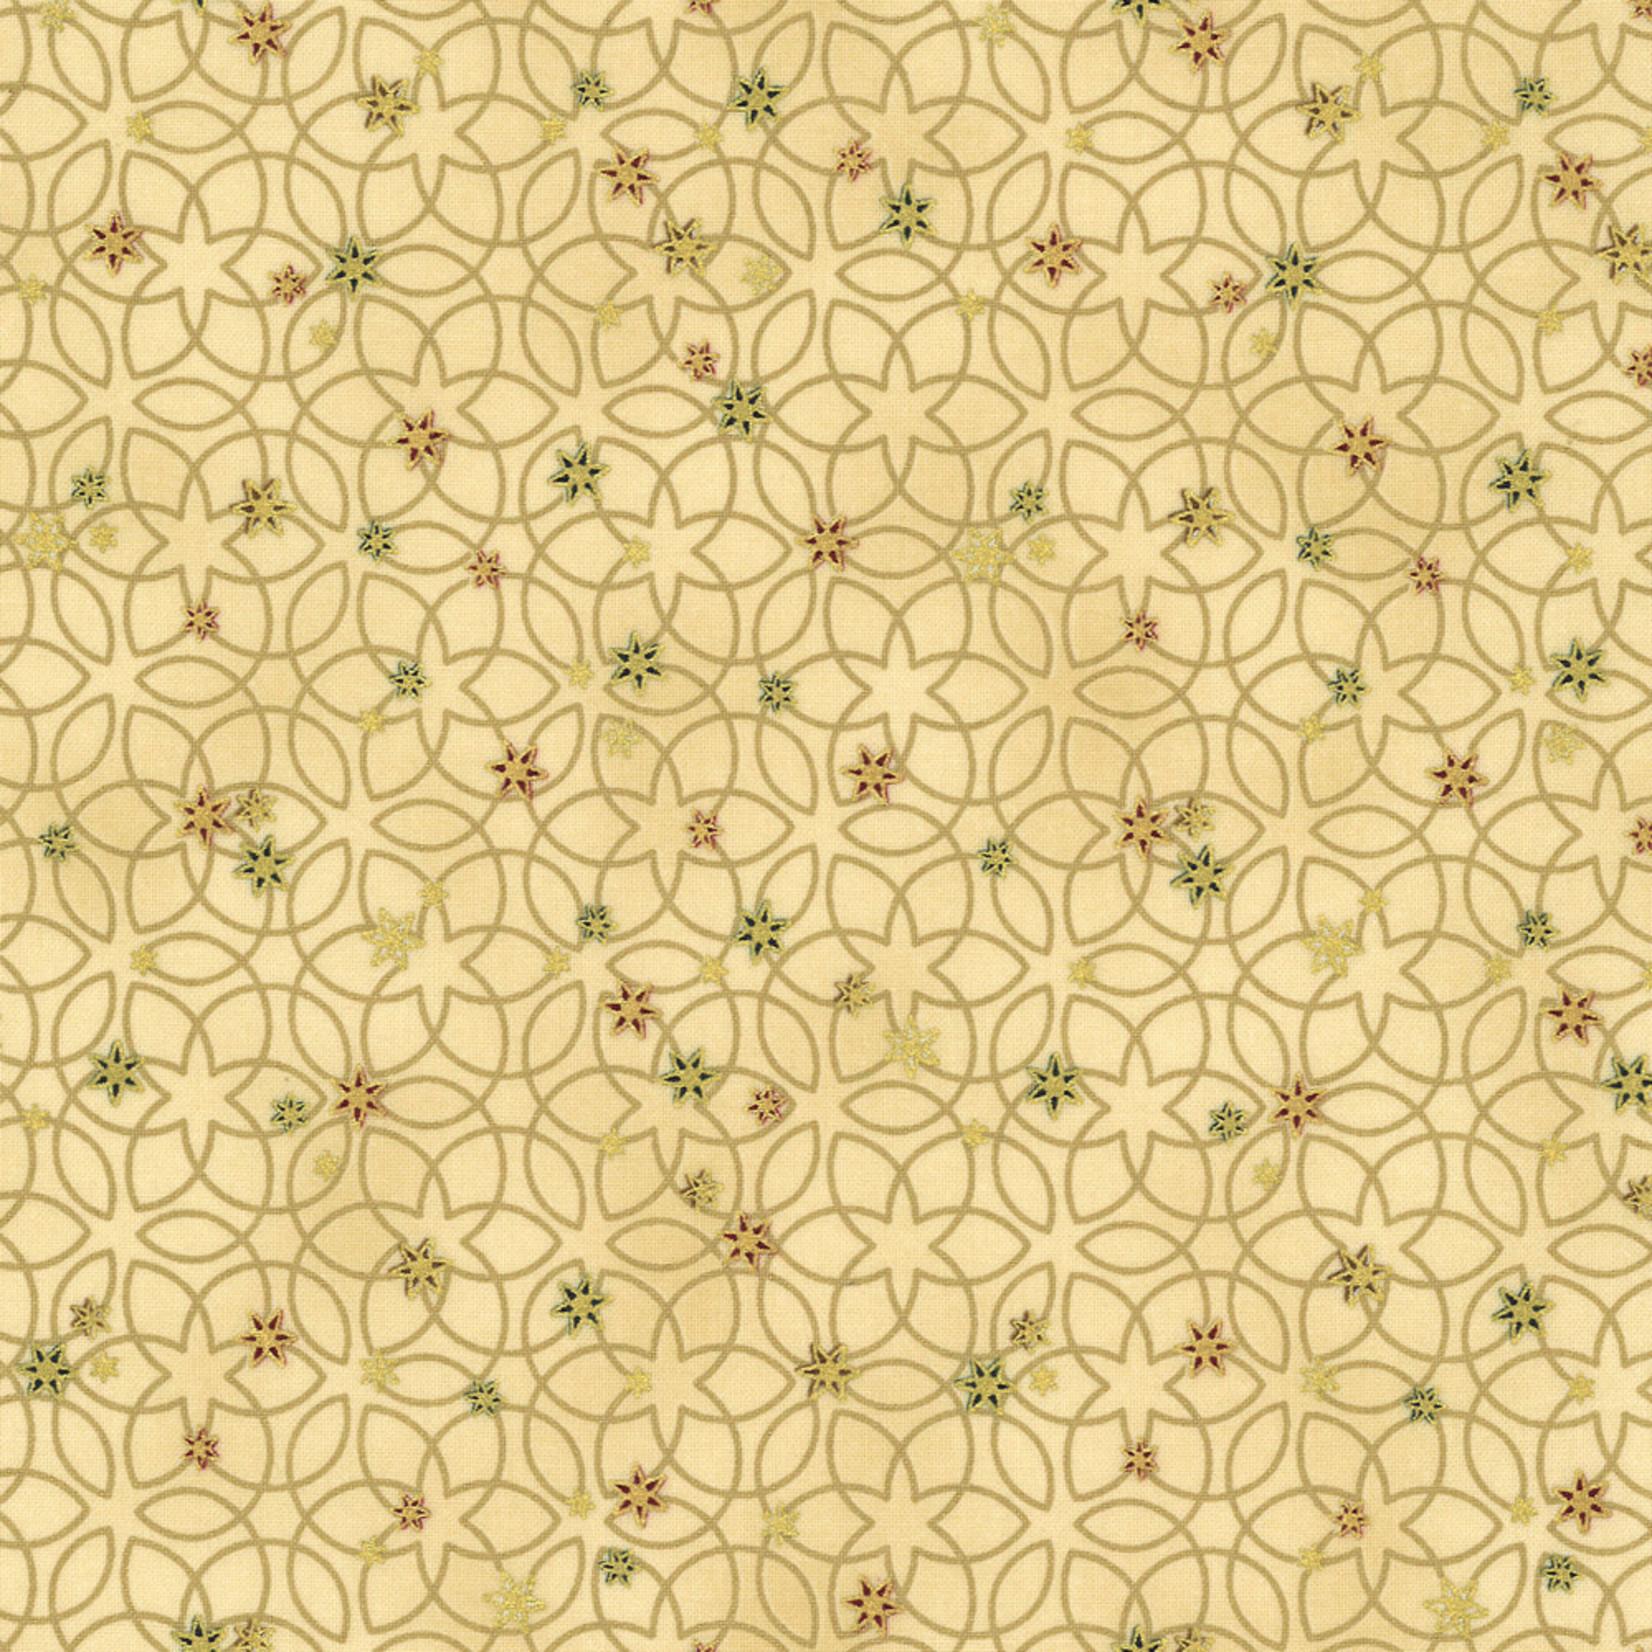 Stof Fabrics Christmas Wonders - Stars & Loops - Beige Gold